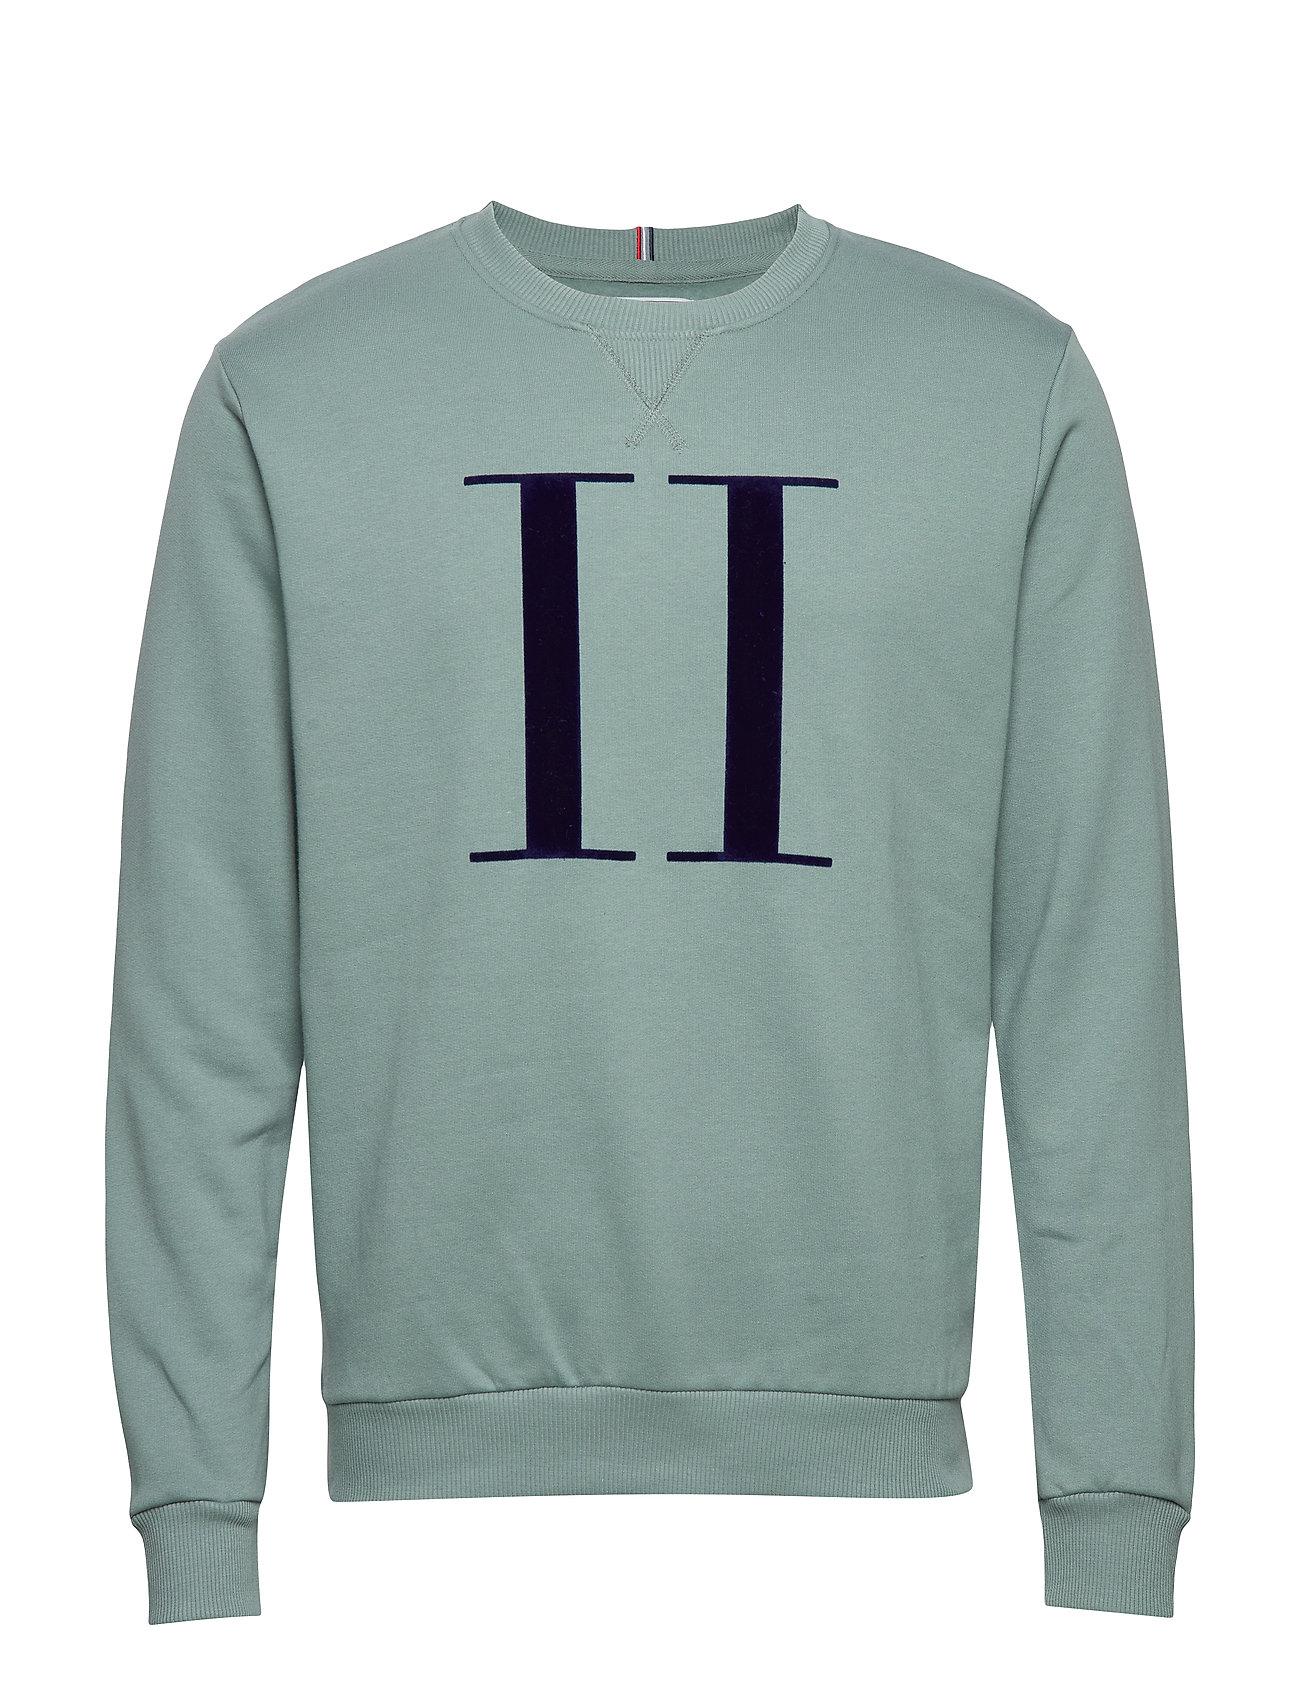 Les Deux Encore Sweatshirt - PETROL BLUE/DK. NAVY